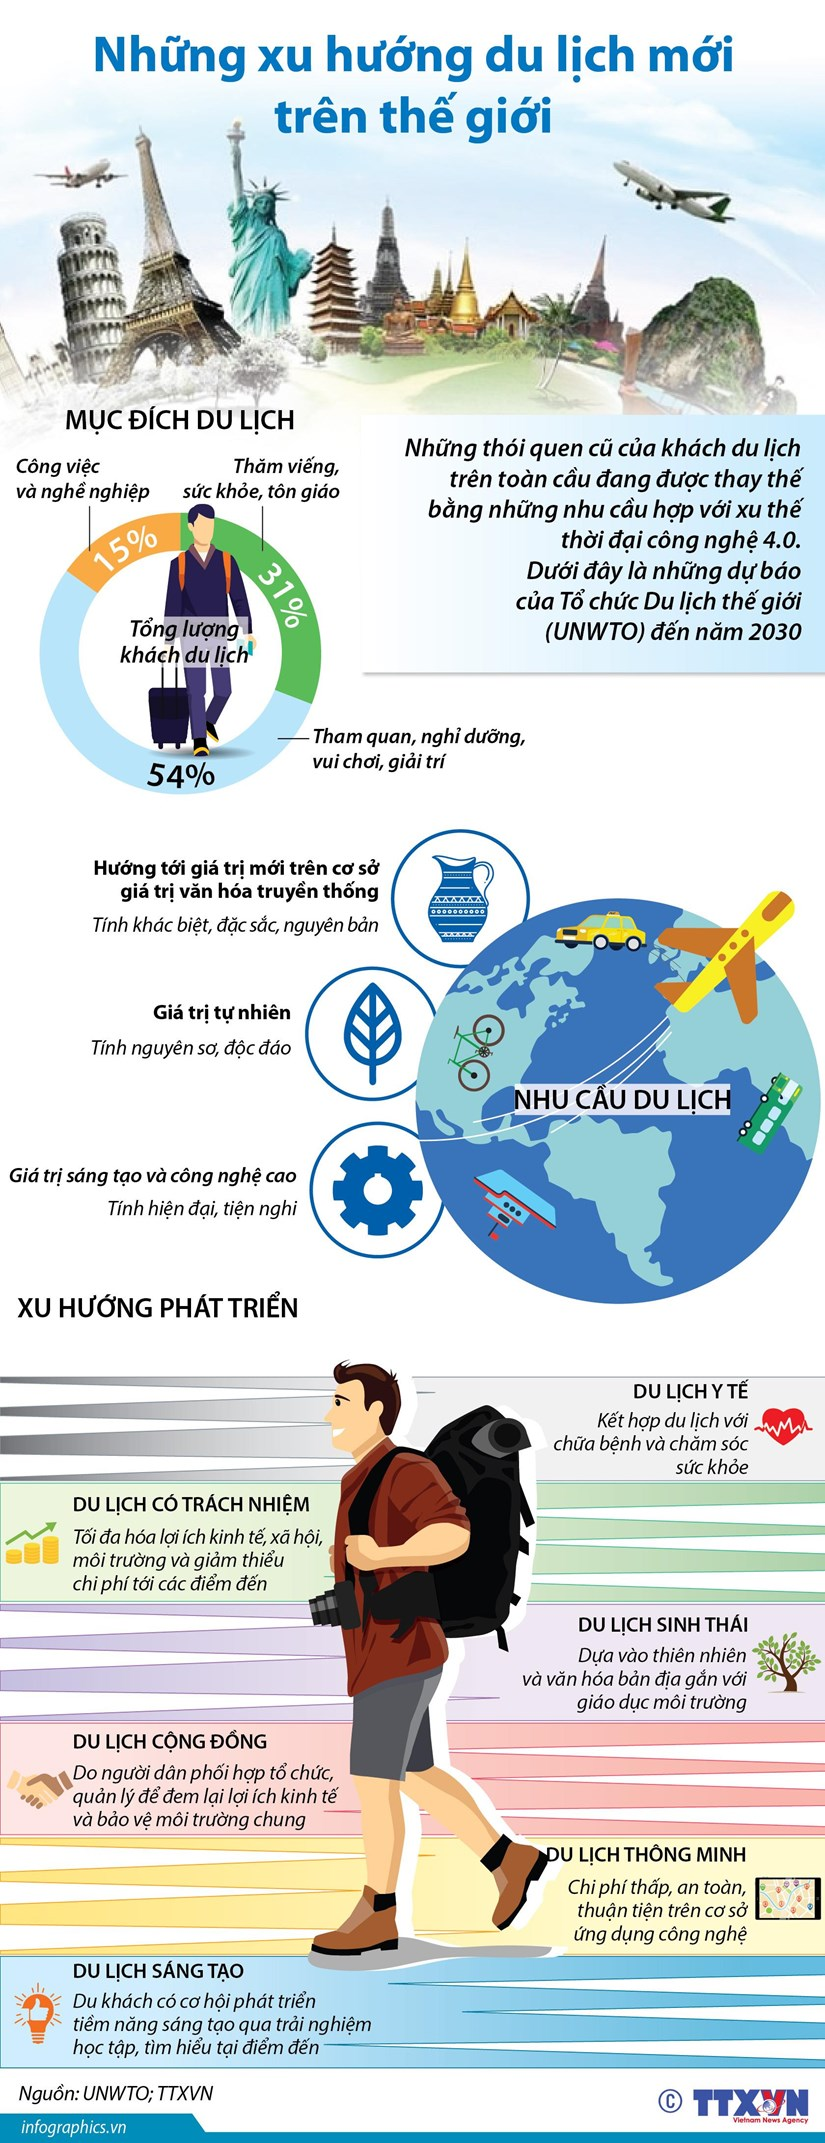 [Infographic] Nhung xu huong du lich moi tren the gioi hinh anh 1